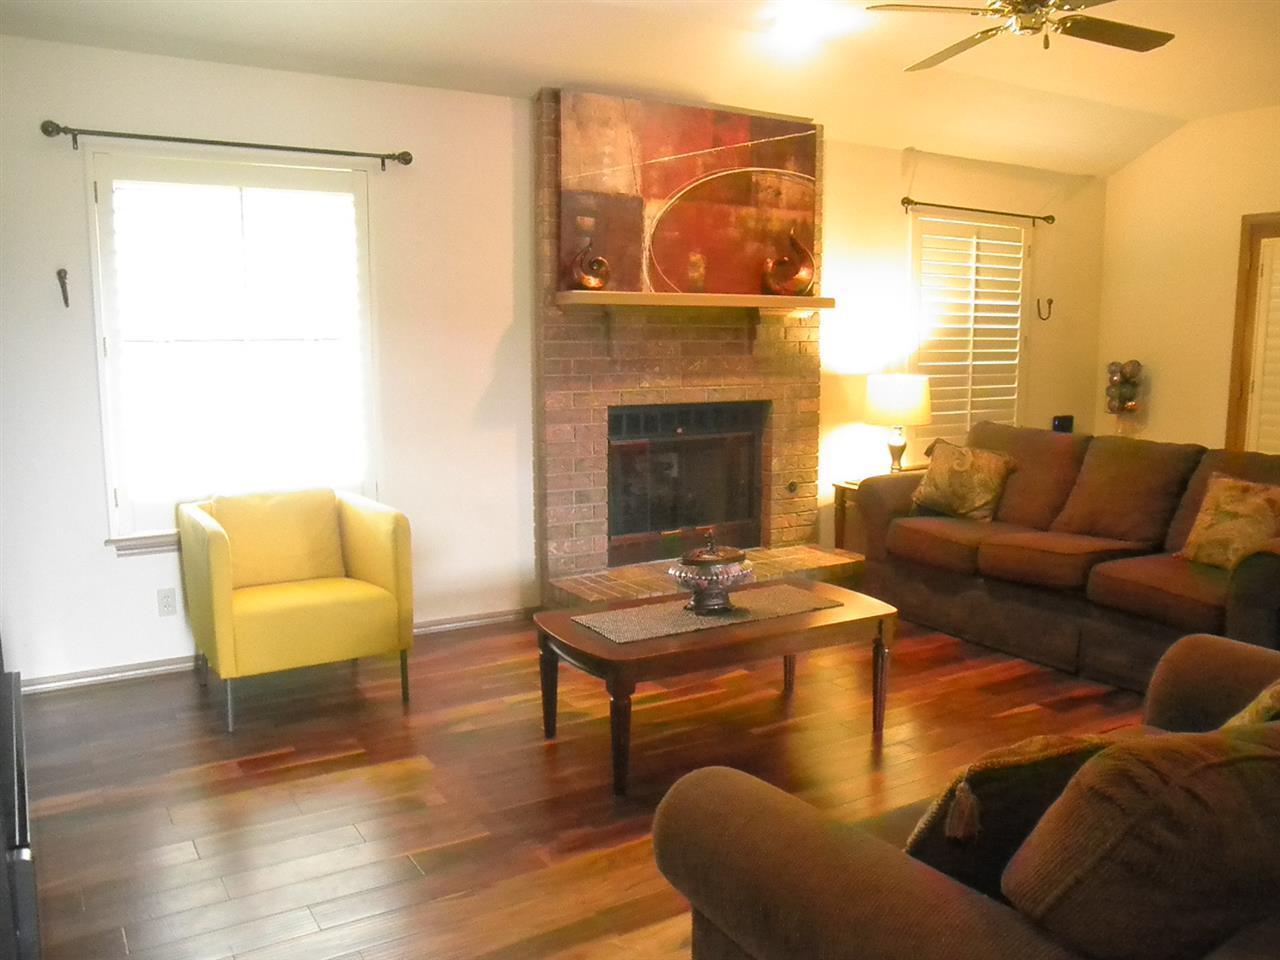 Sold Intraoffice W/MLS | 400 Lonnie Ponca City, OK 74601 2